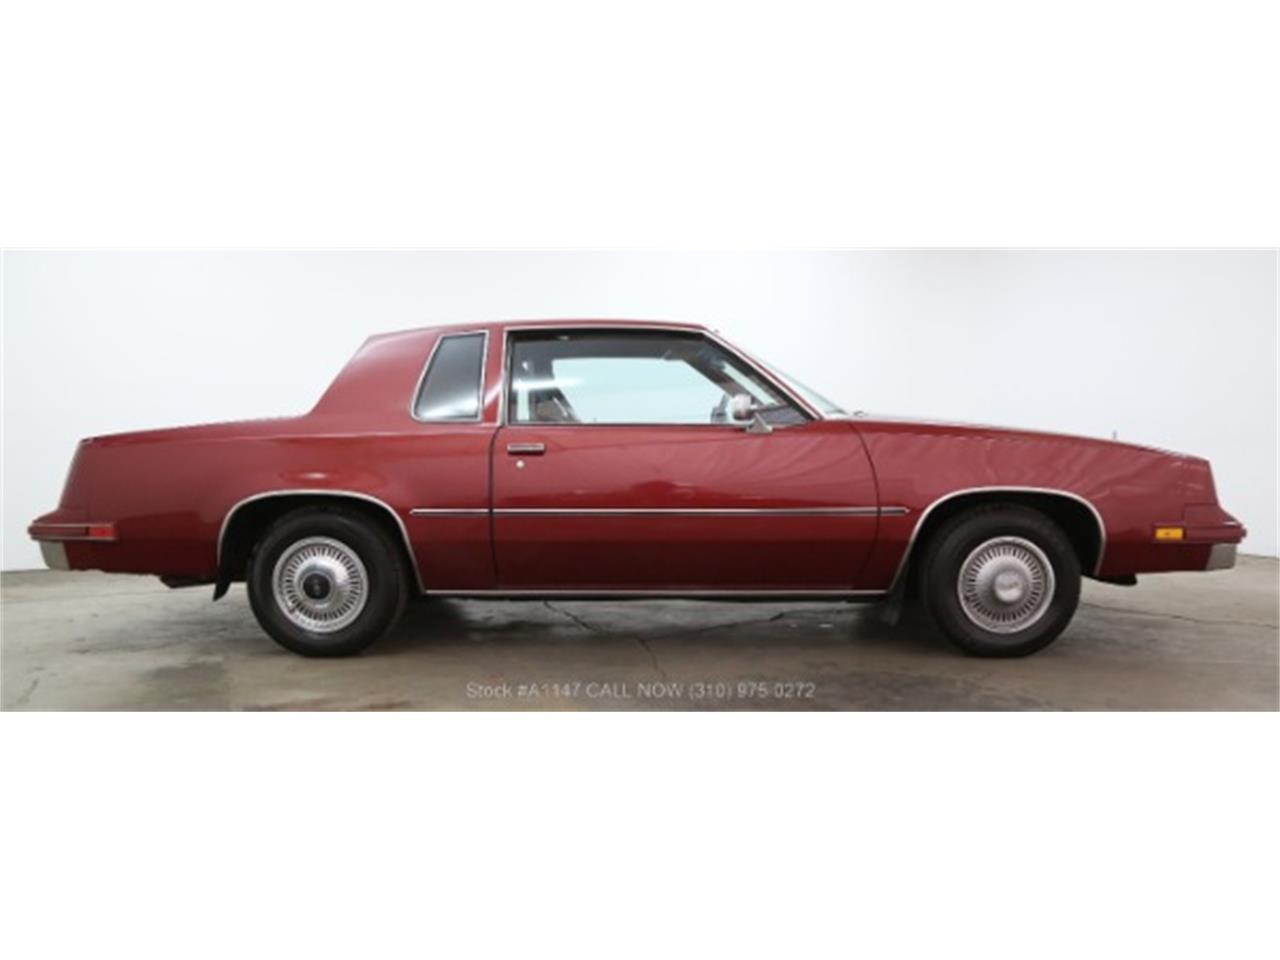 1981 oldsmobile cutlass supreme for sale classiccars com cc 1130328 1981 oldsmobile cutlass supreme for